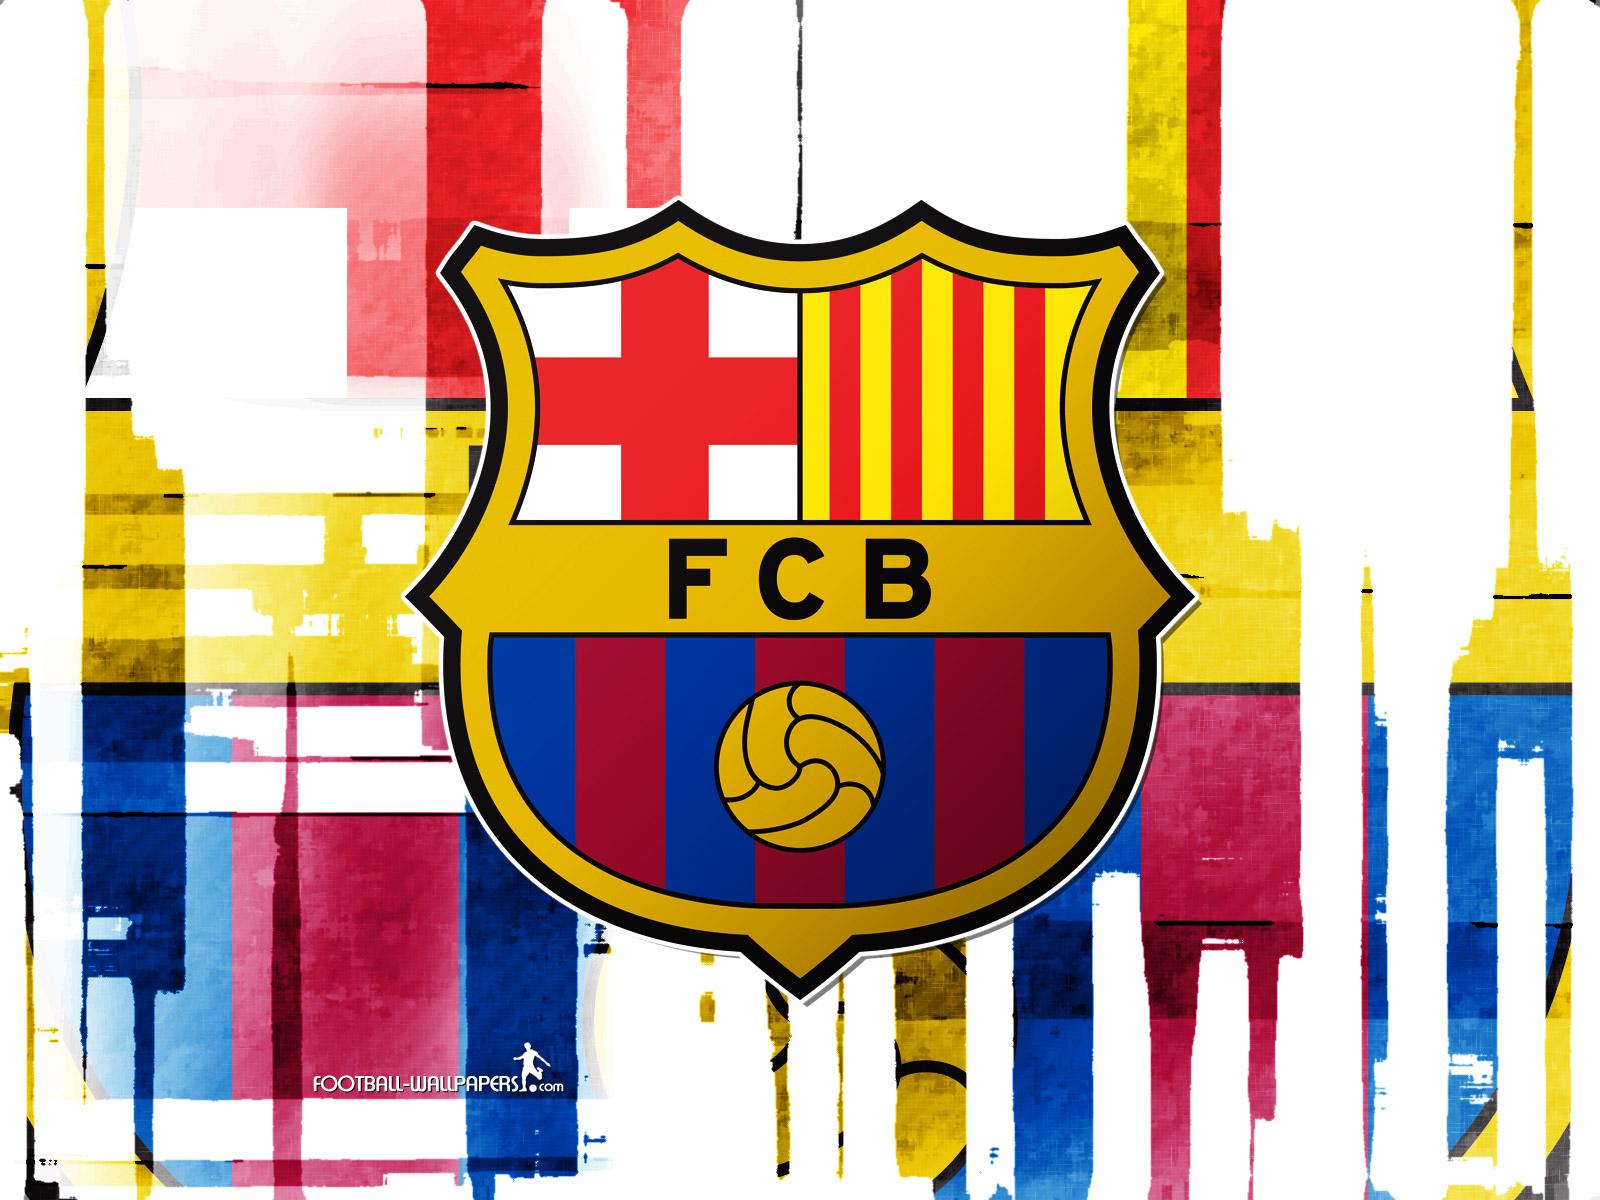 http://1.bp.blogspot.com/-vf9onMHaCBQ/ThRq1L6ZN6I/AAAAAAAAArg/NImh70_SlAs/s1600/Barcelona%2BWallpaper%2B8.jpg